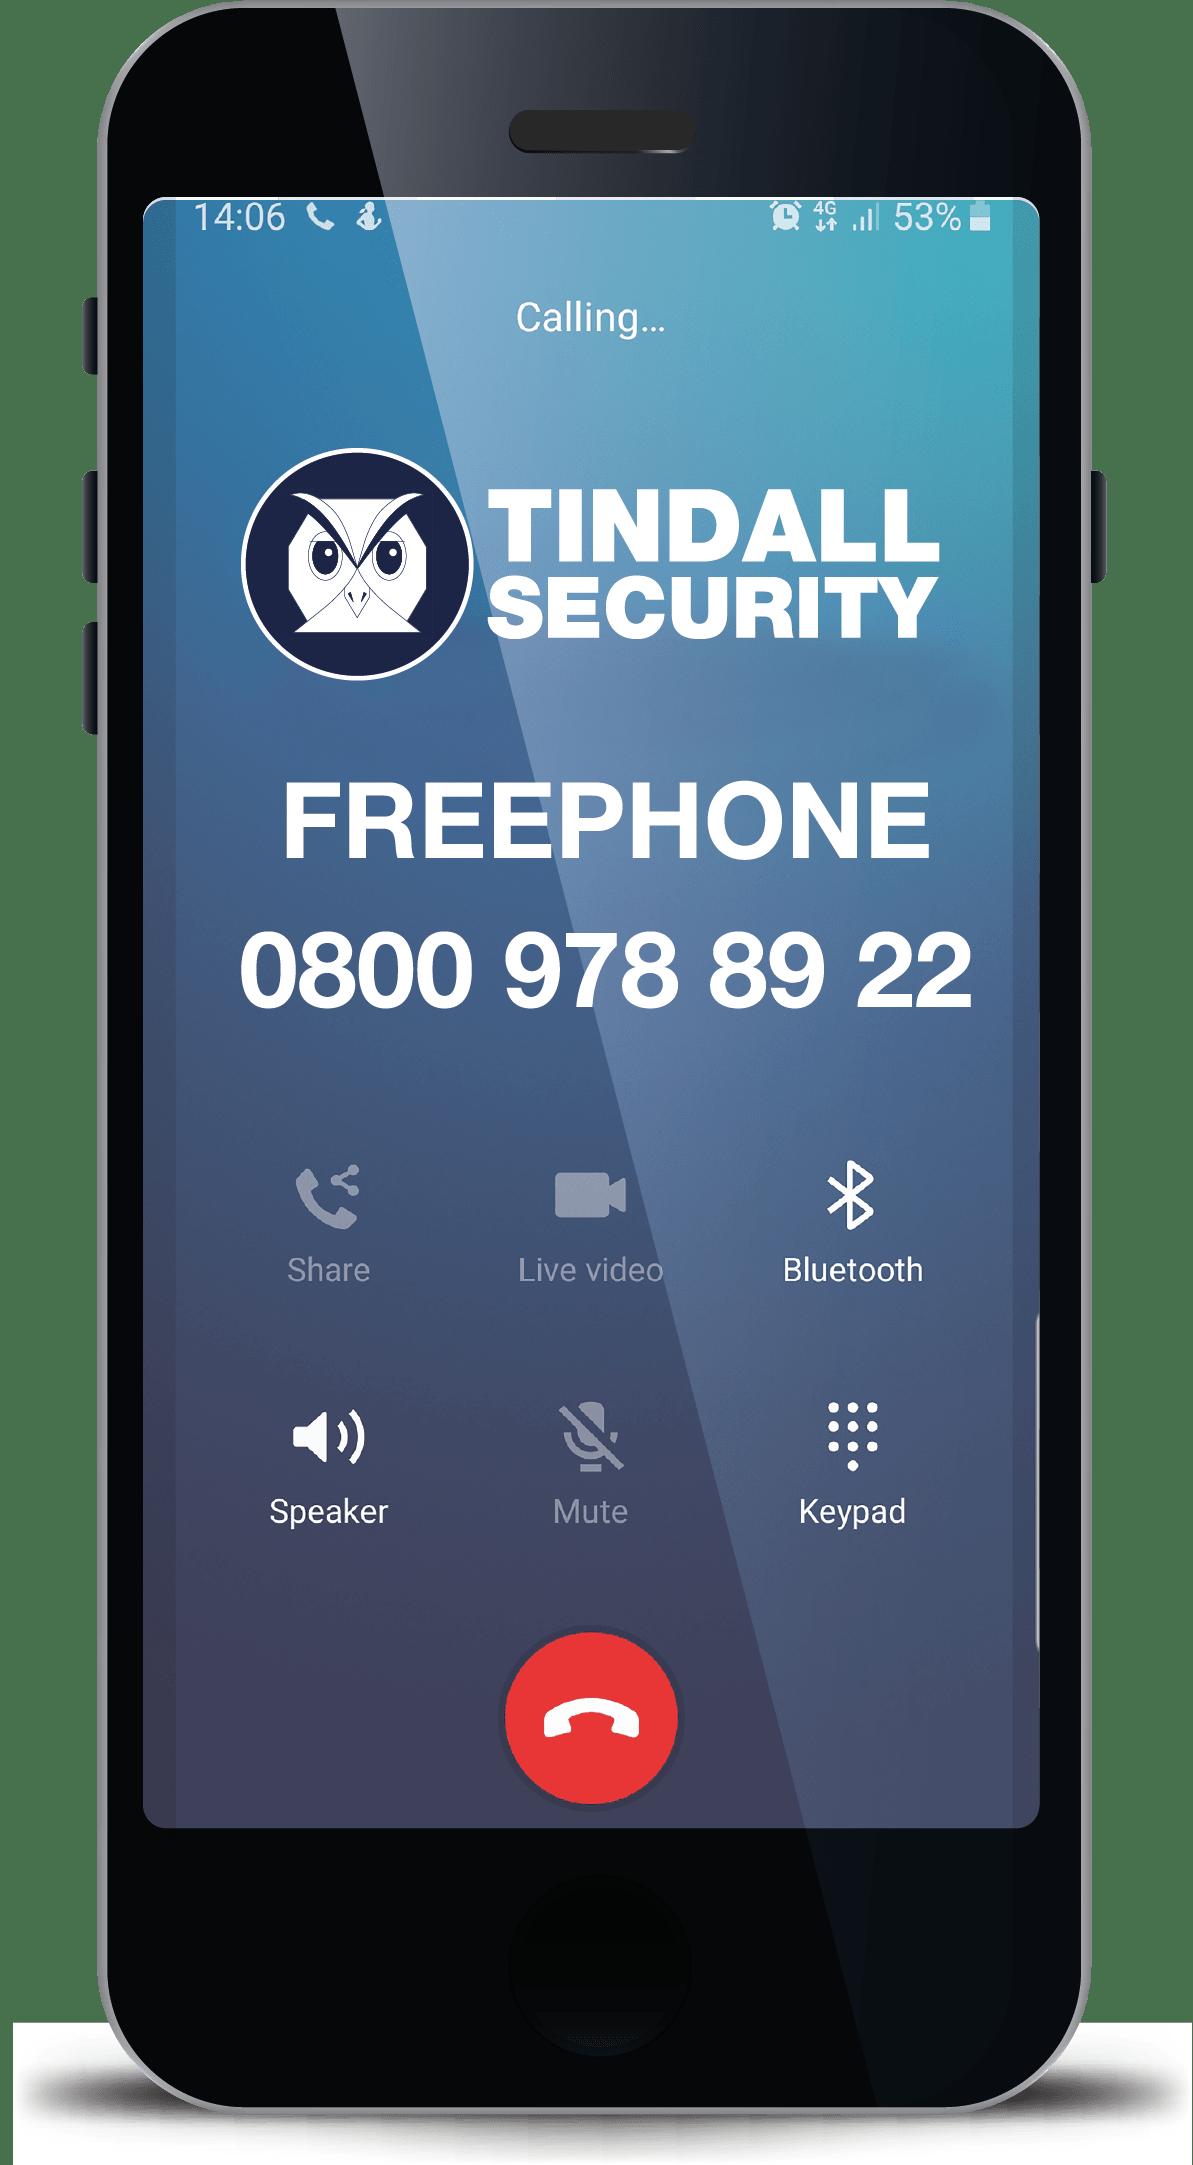 call tindall security